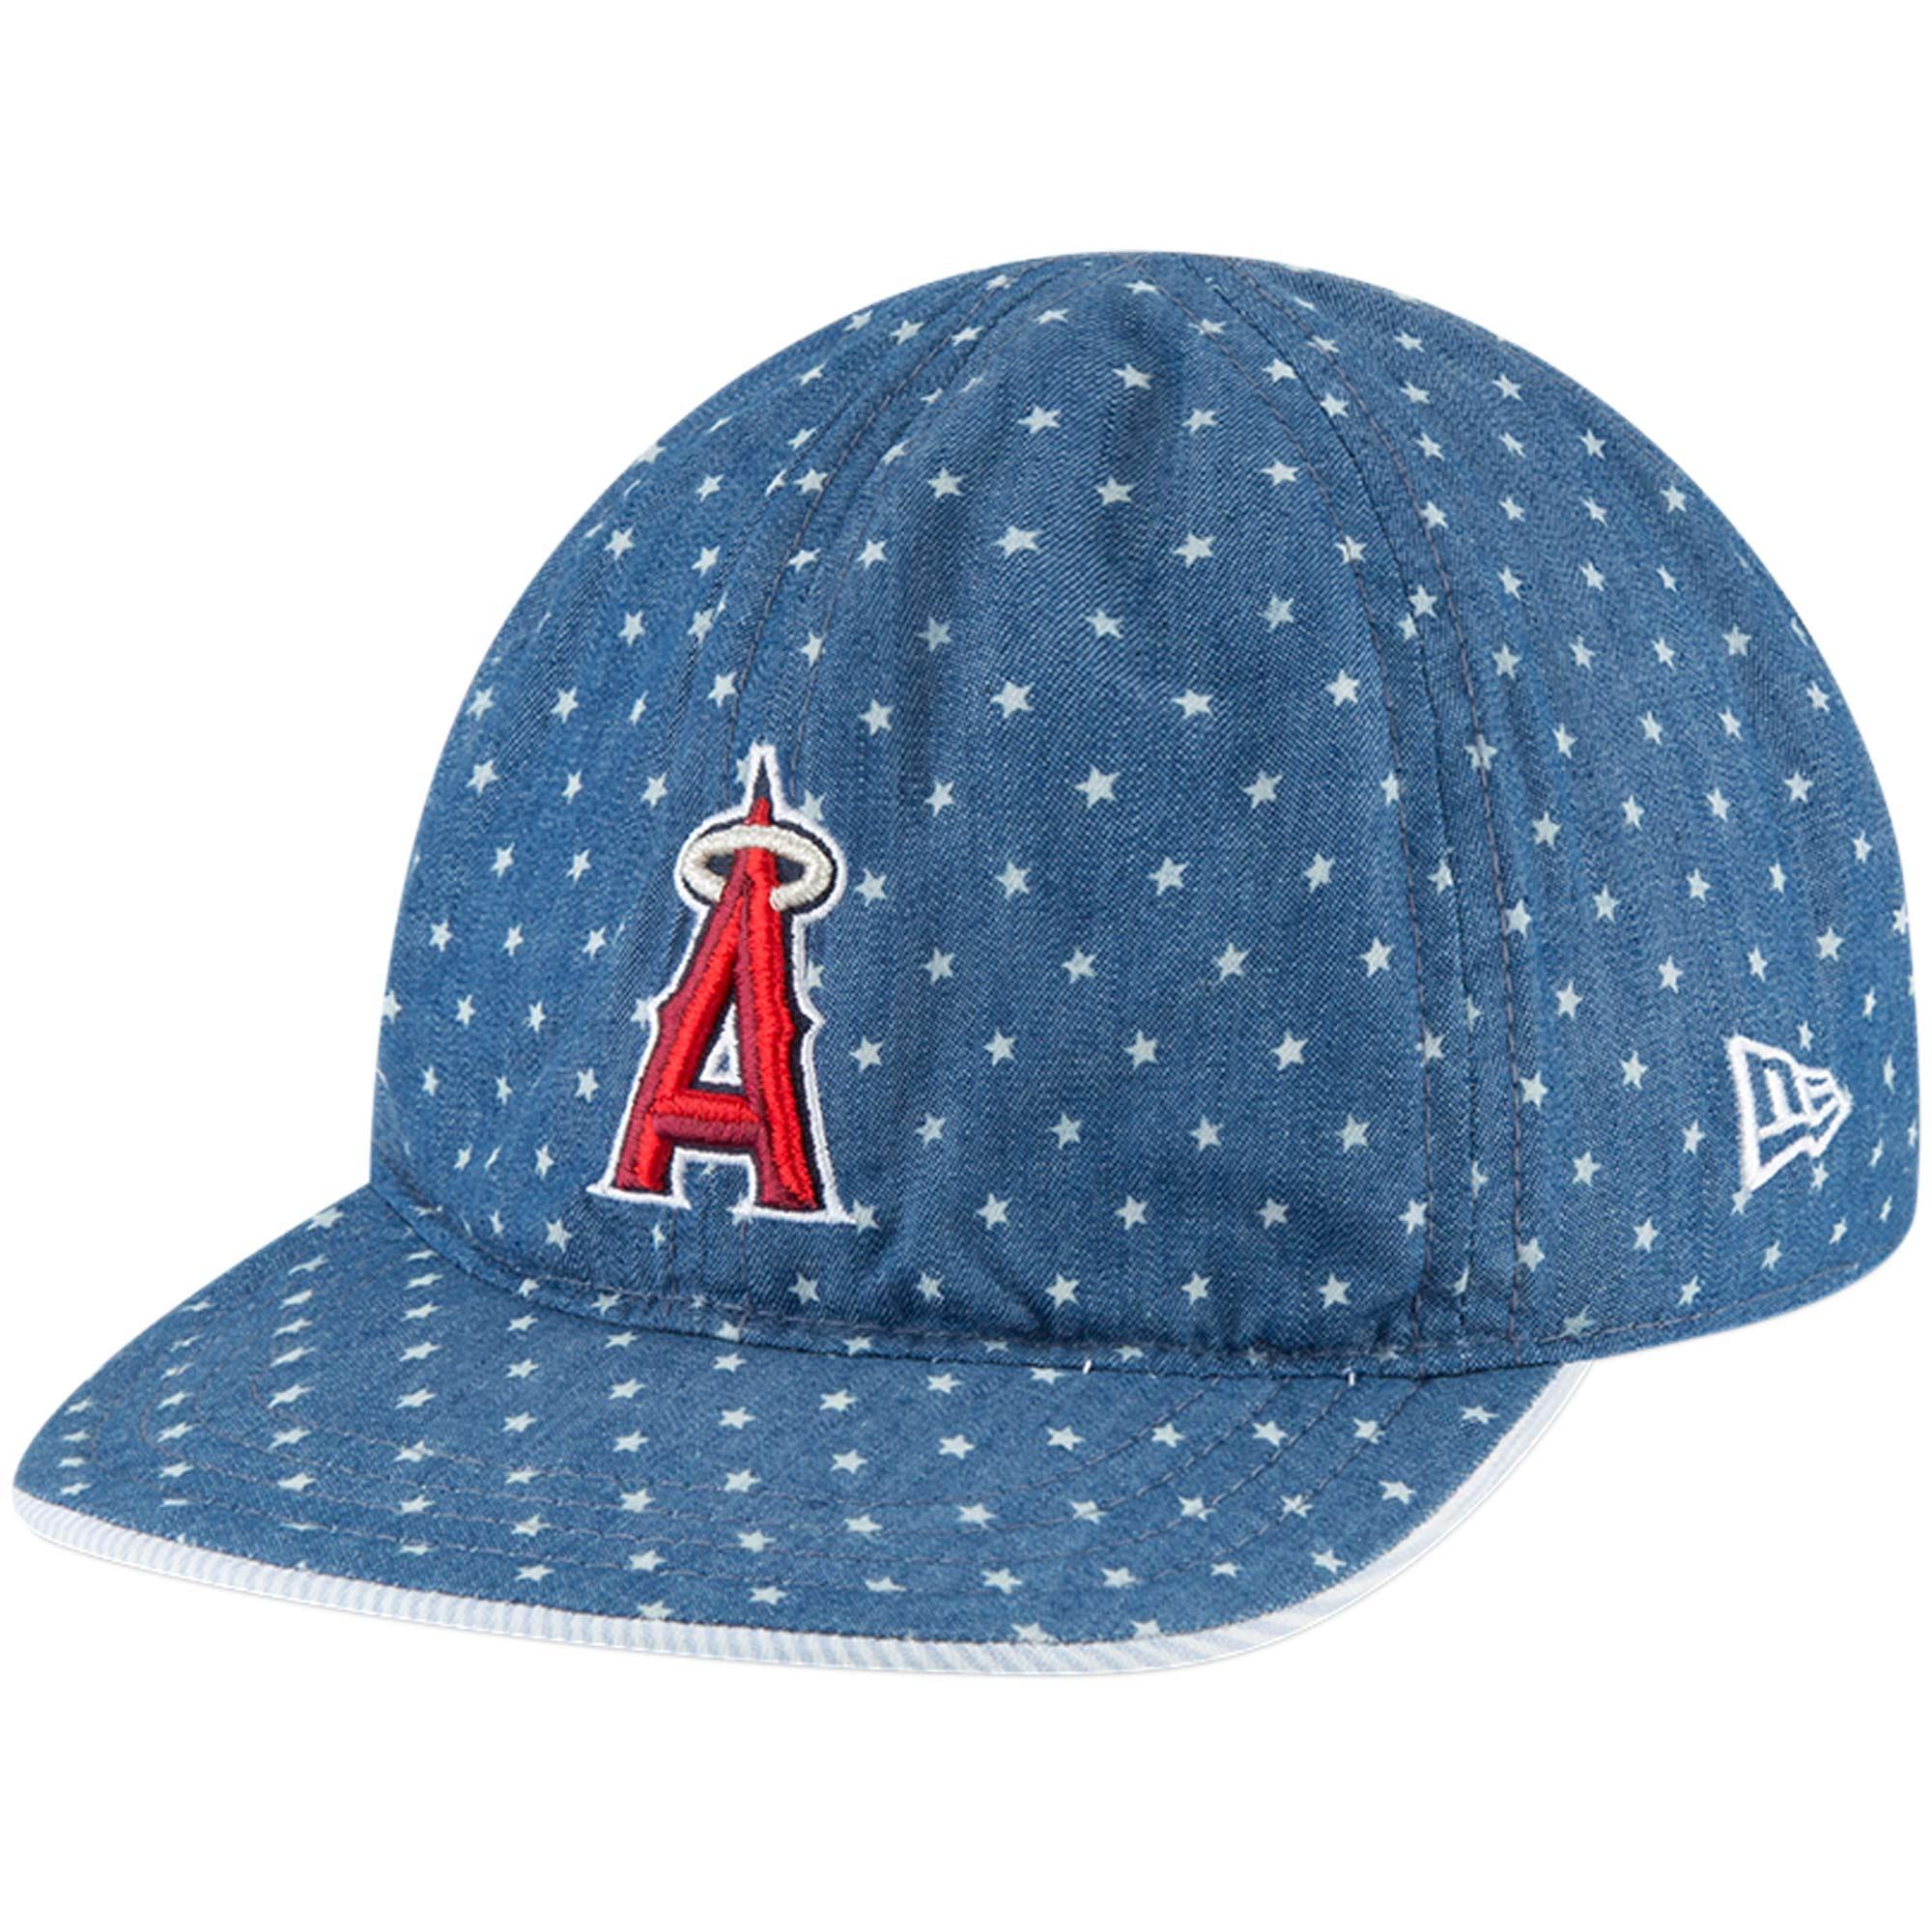 Los Angeles Angels New Era Infant Flip 9TWENTY Adjustable Hat - Denim/White - OSFA